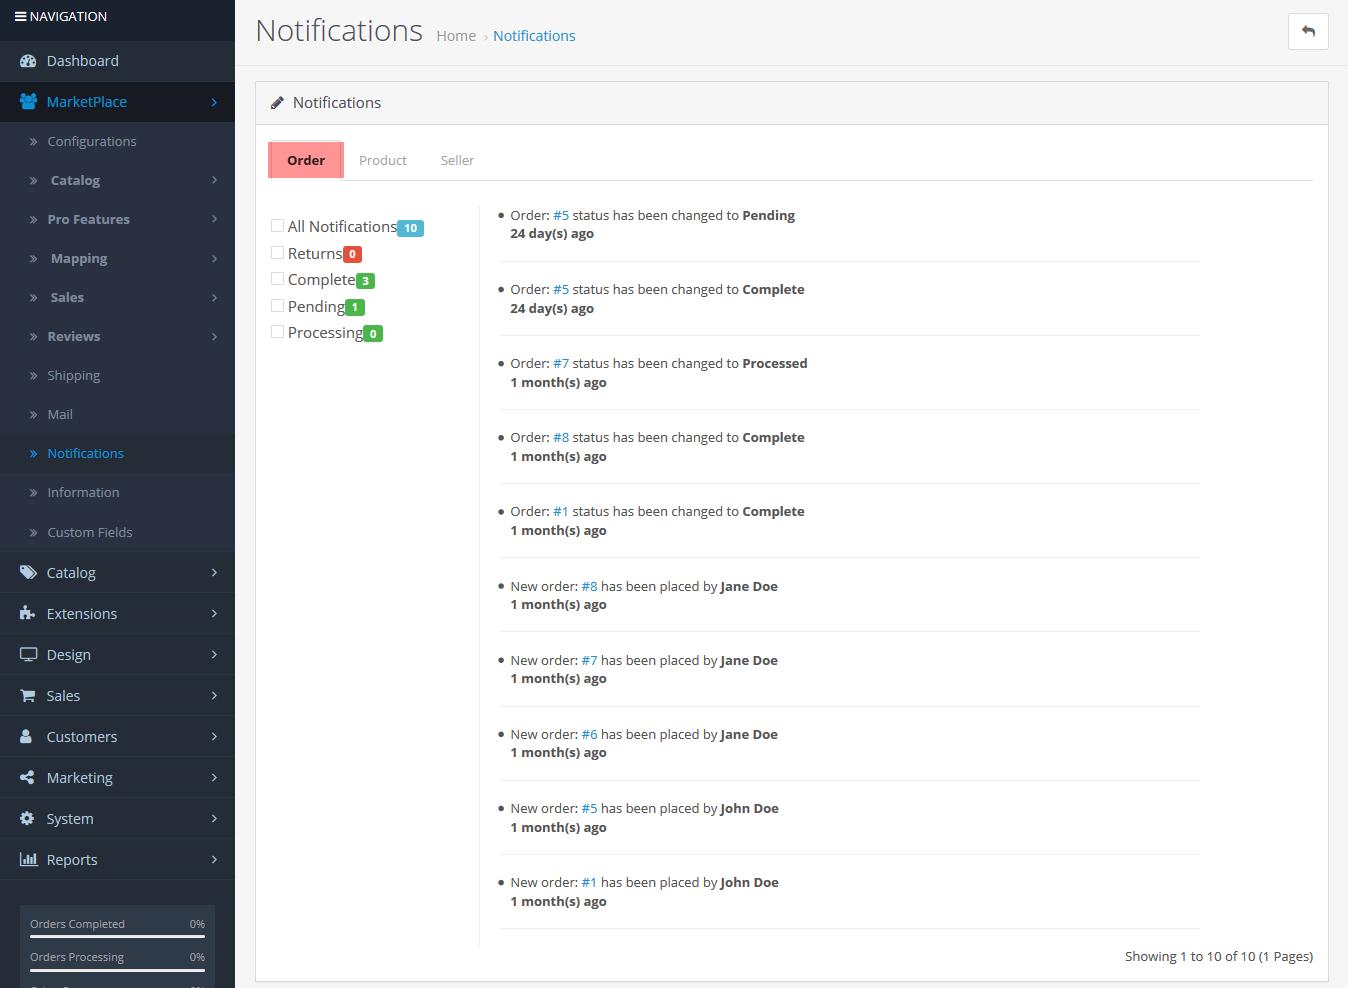 marketplace_notifications